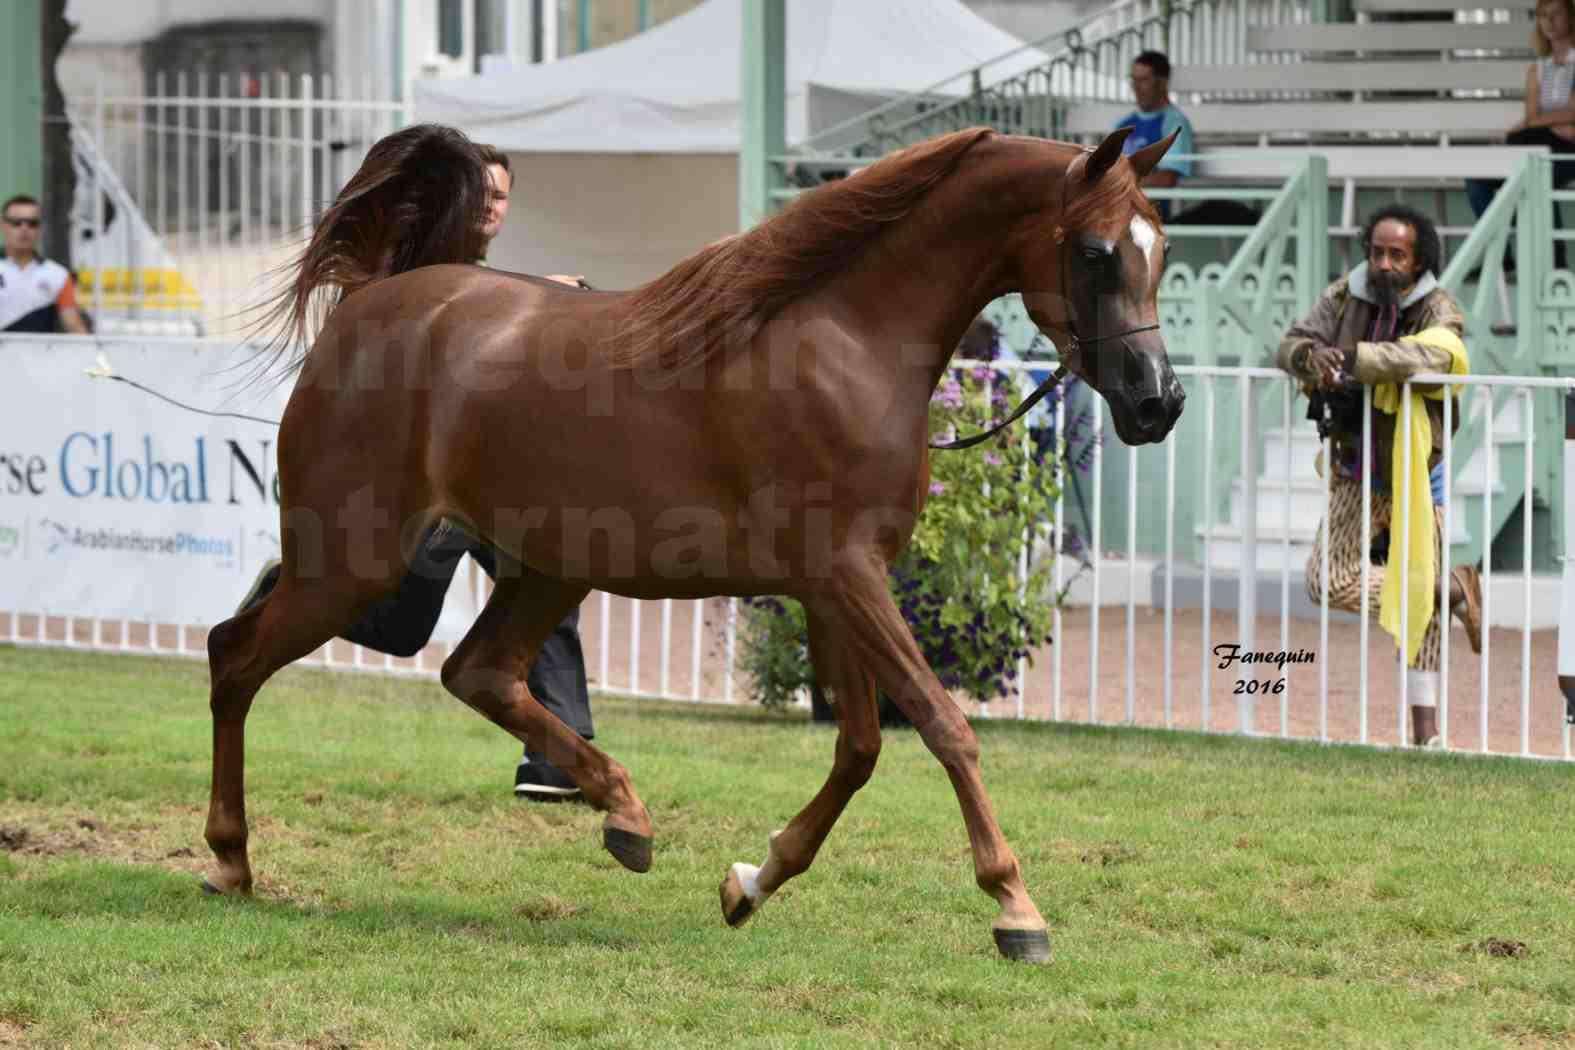 International Arabian Horse Show B de VICHY 2016 - PEARL DE DJOON - Notre Sélection - 29